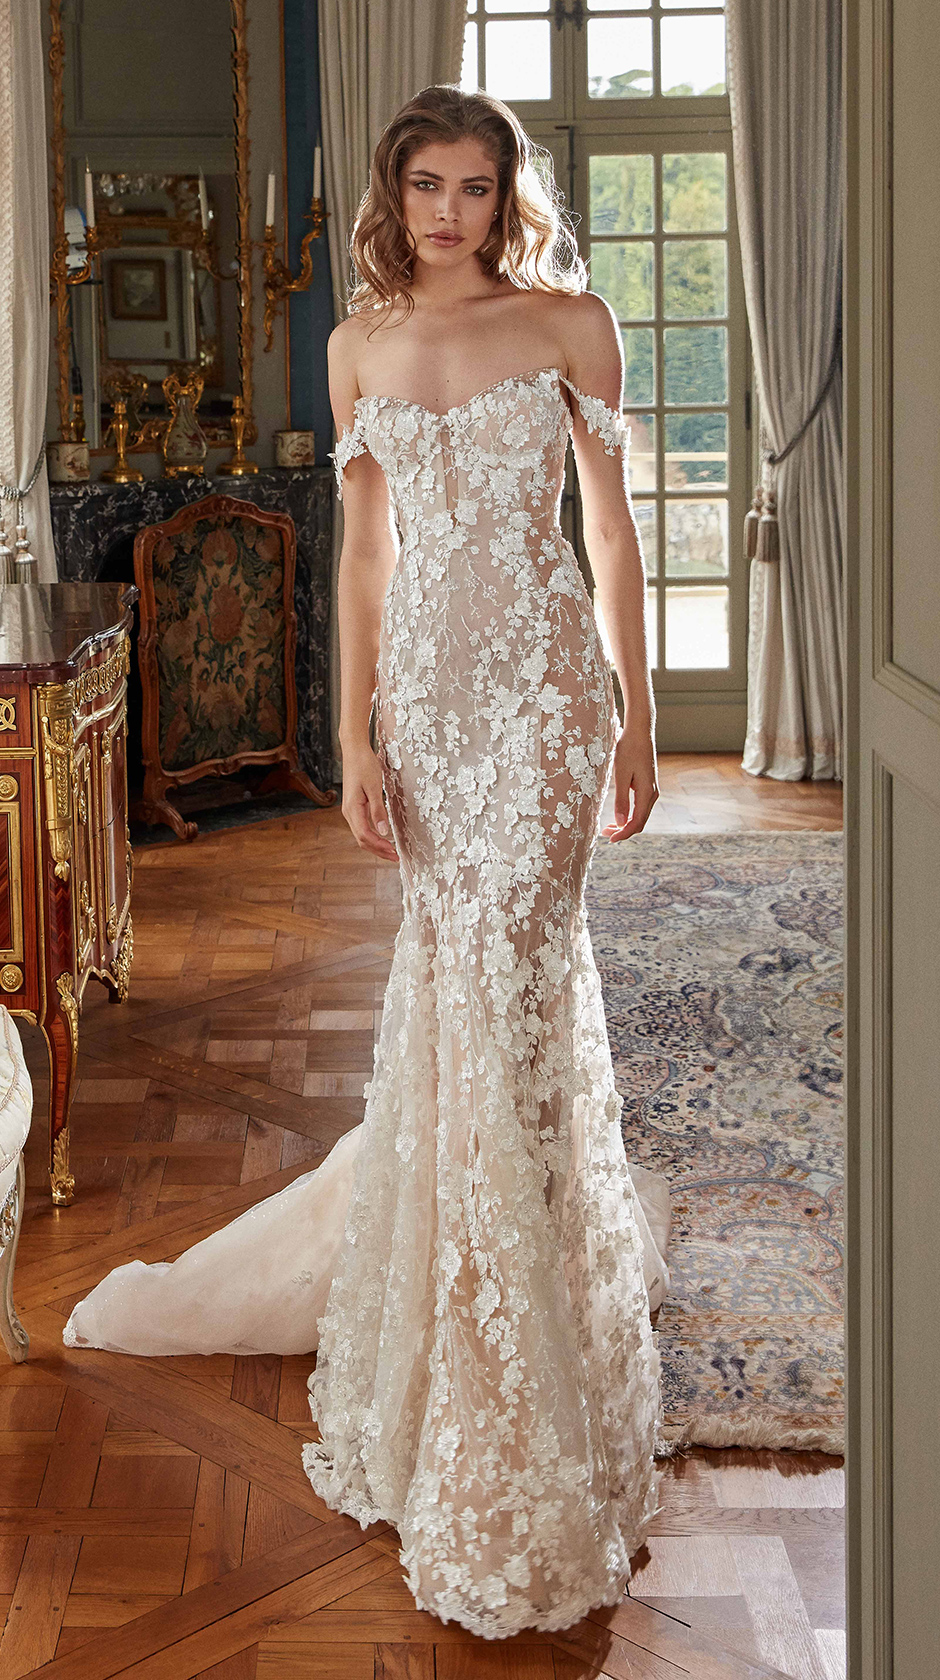 wedding dress size 20 petite off 20   medpharmres.com